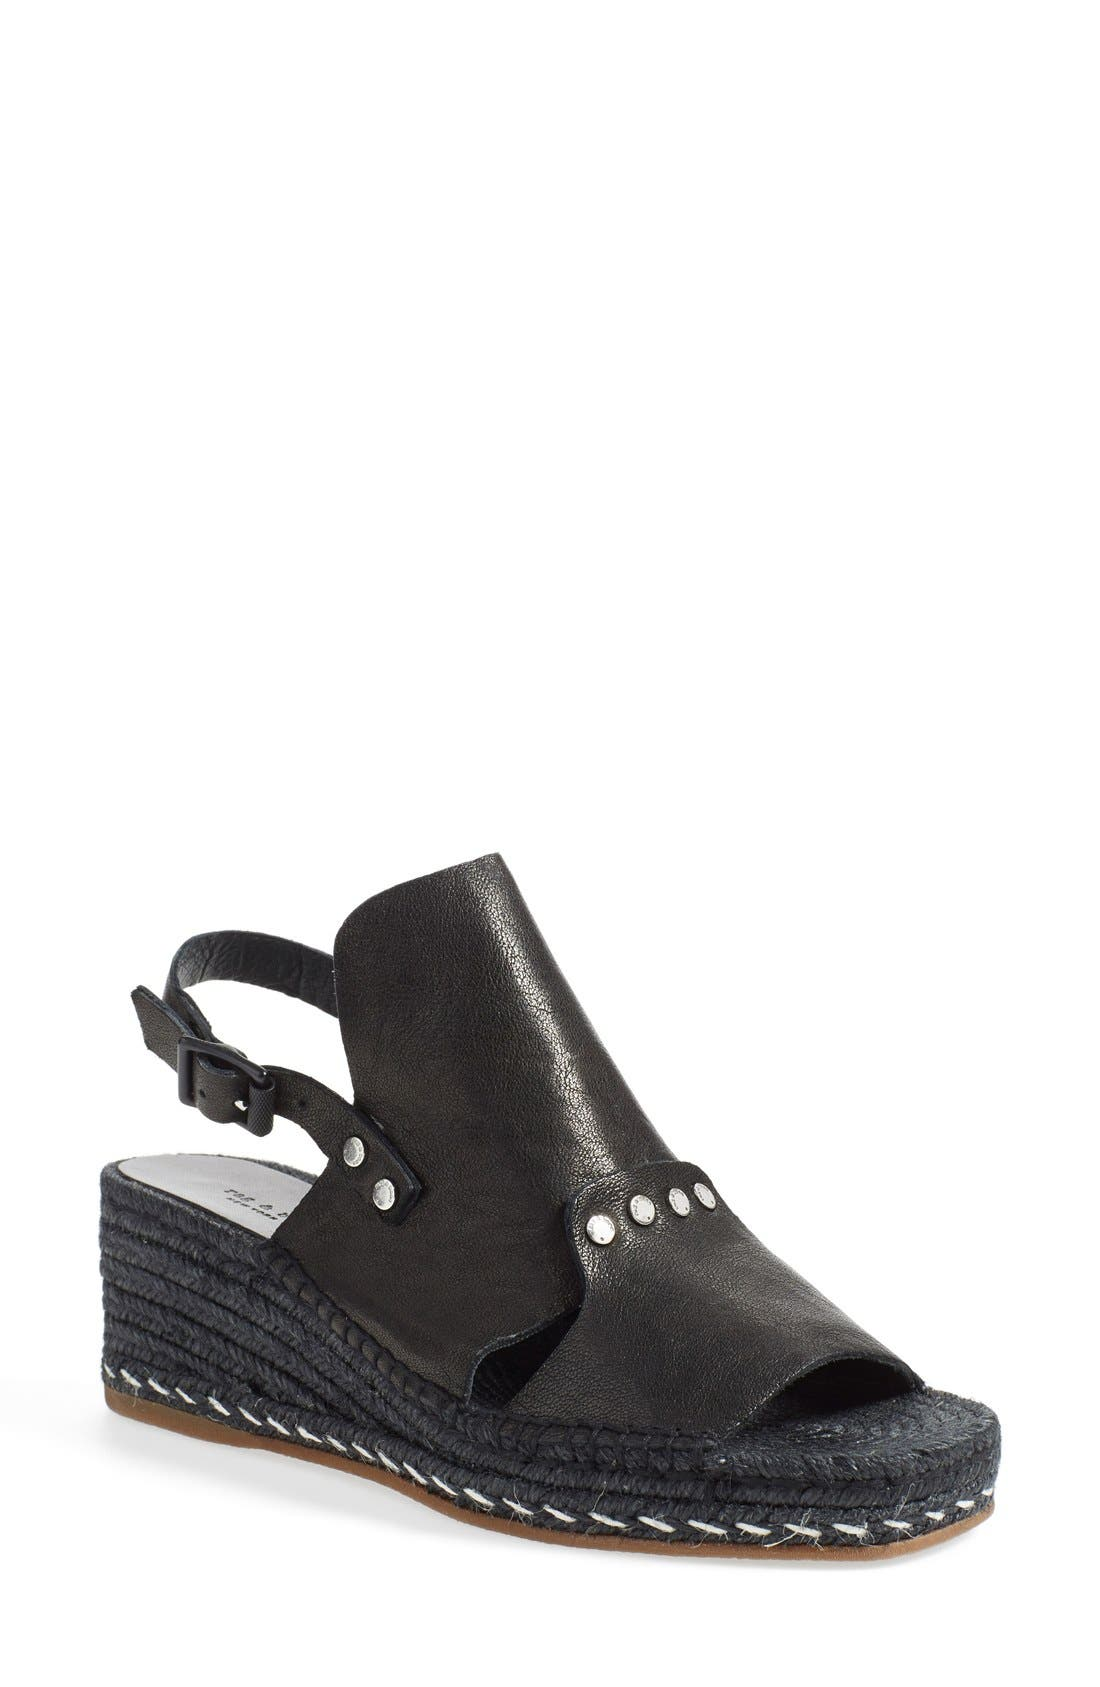 RAG & BONE 'Sayre II' Espadrille Wedge Sandal, Main, color, 001